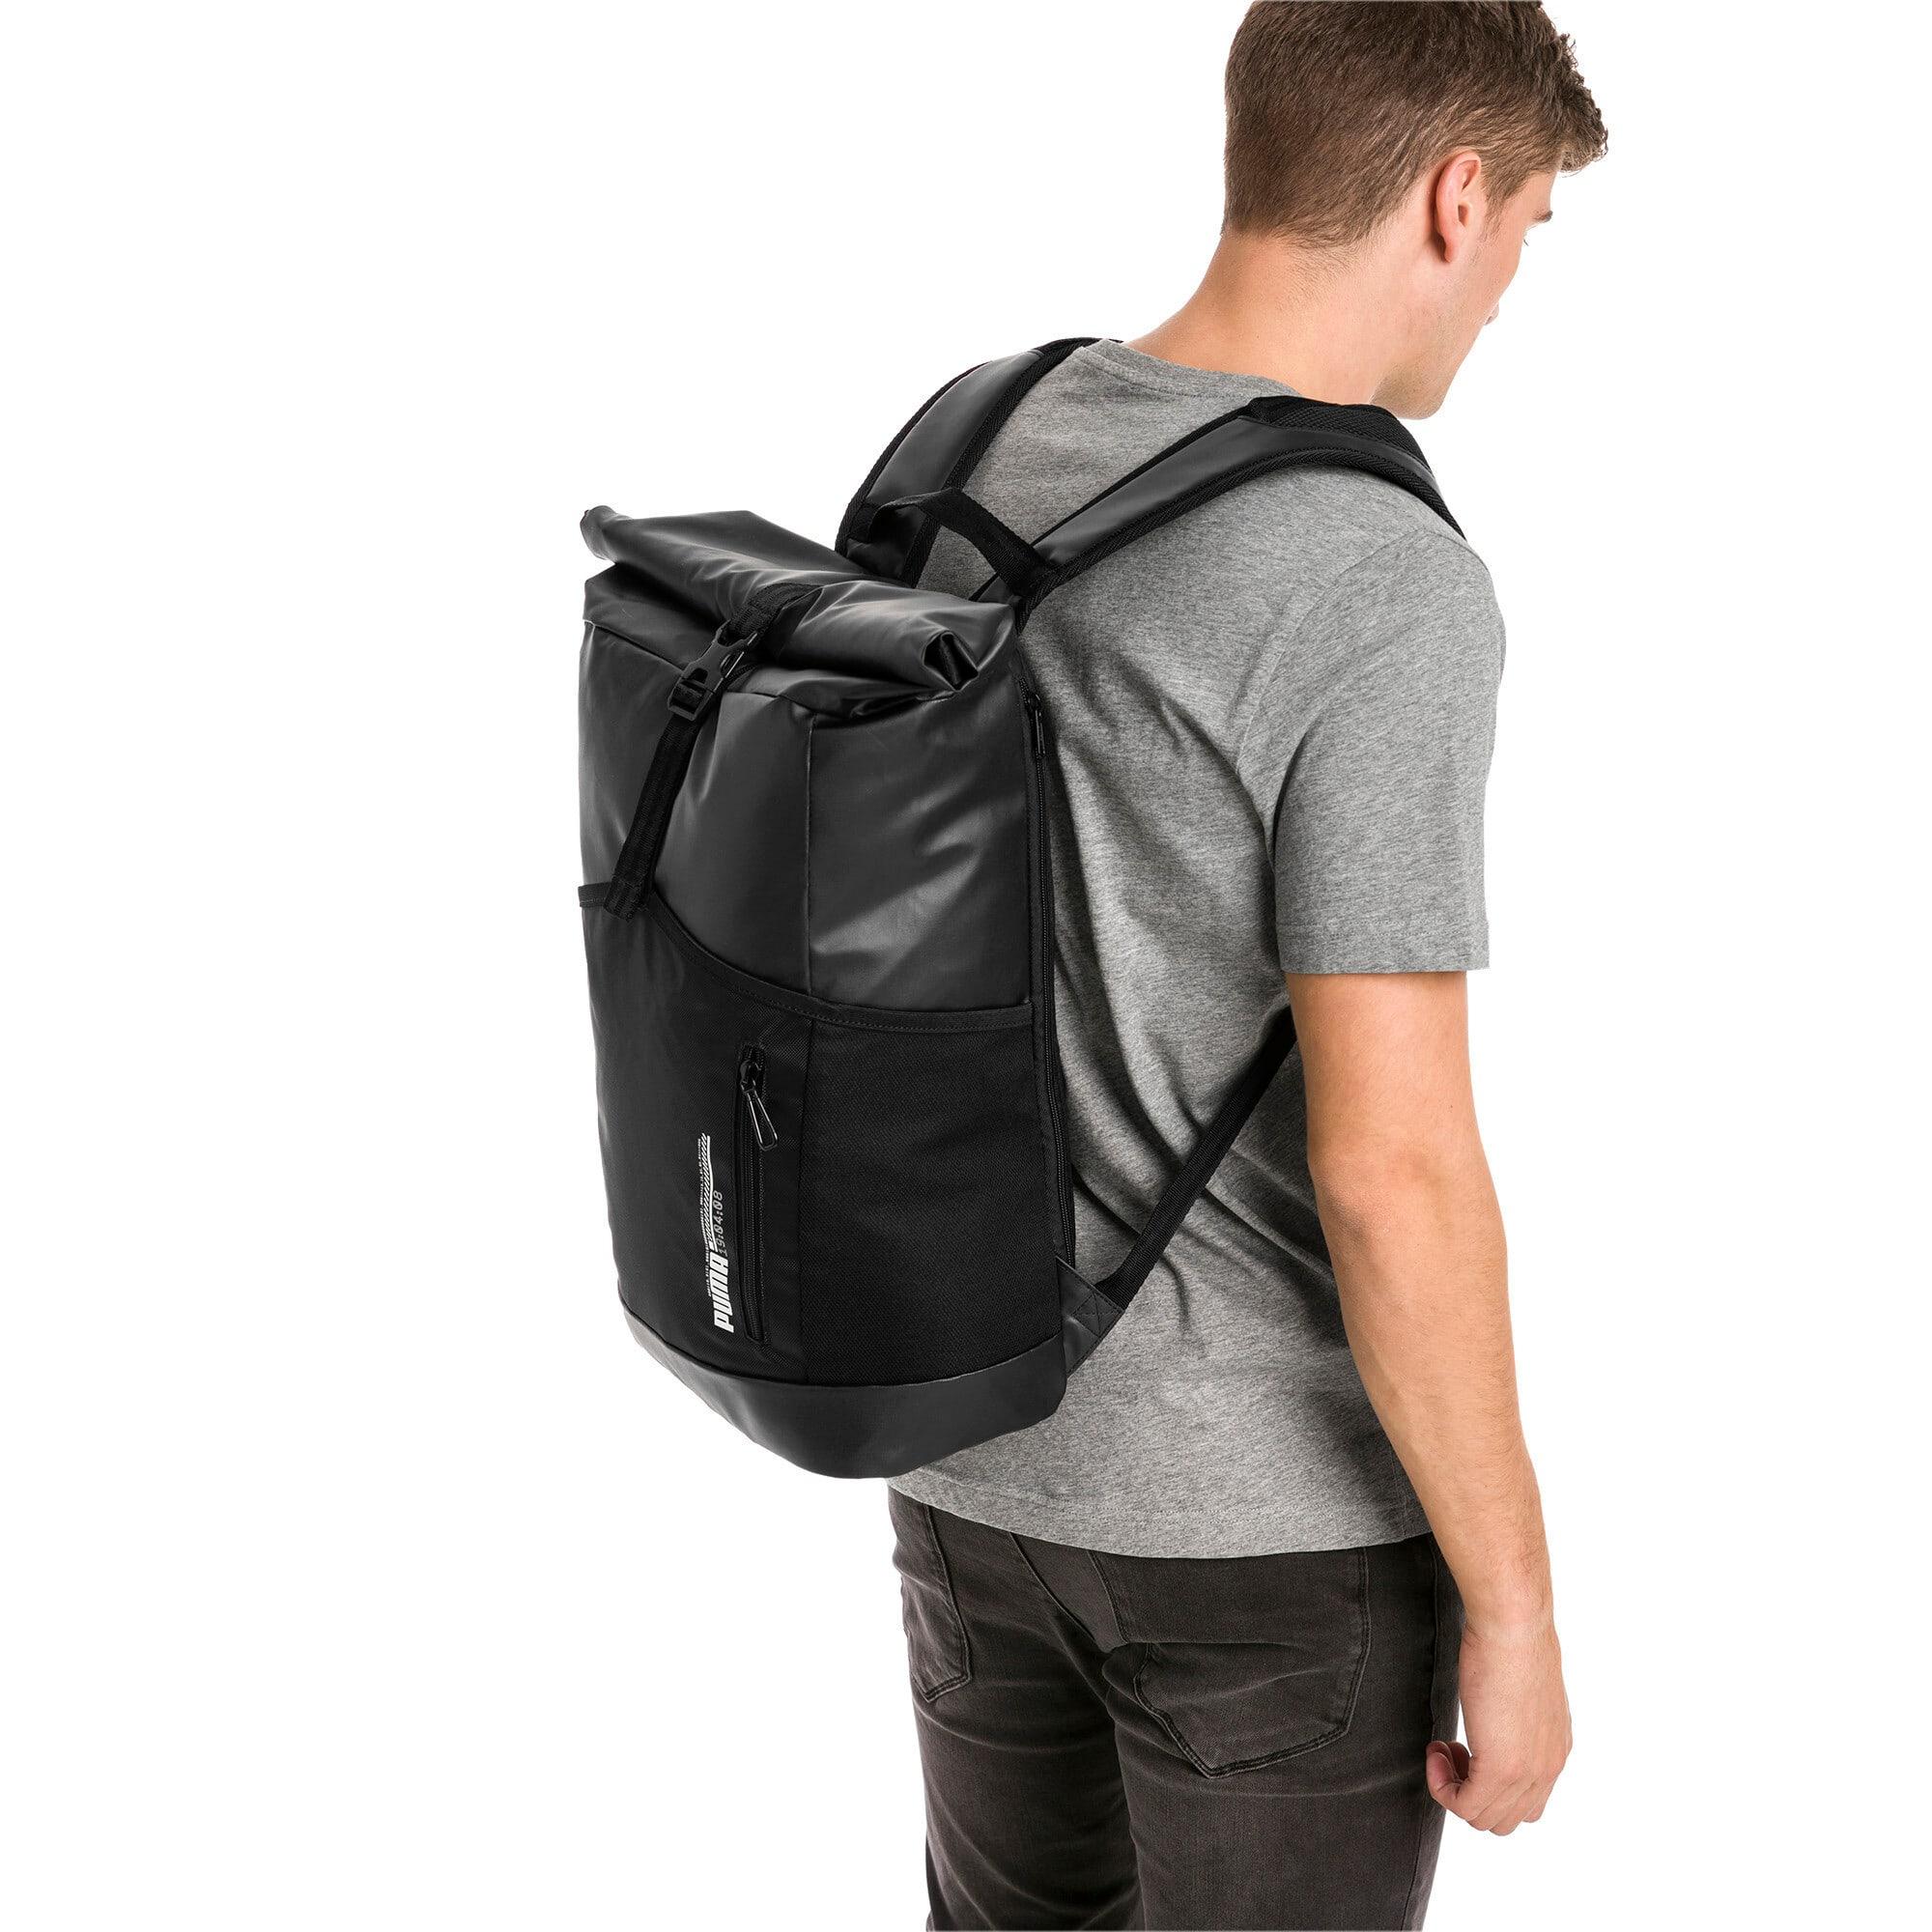 Thumbnail 2 of Energy Rolltop Backpack, Puma Black, medium-IND